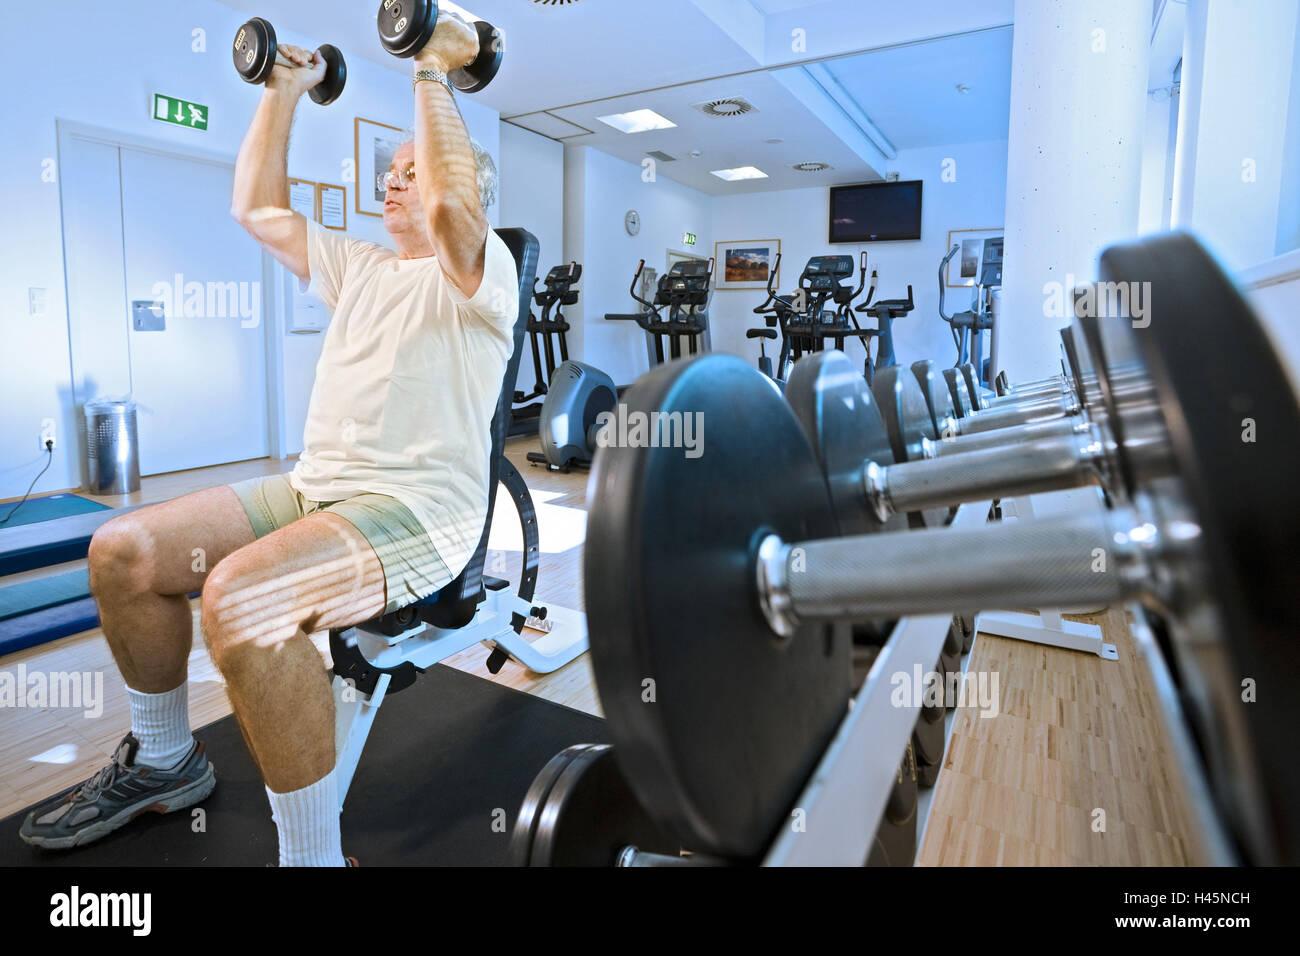 Fitness studio, senior, dumbbell training, weights, practise, - Stock Image